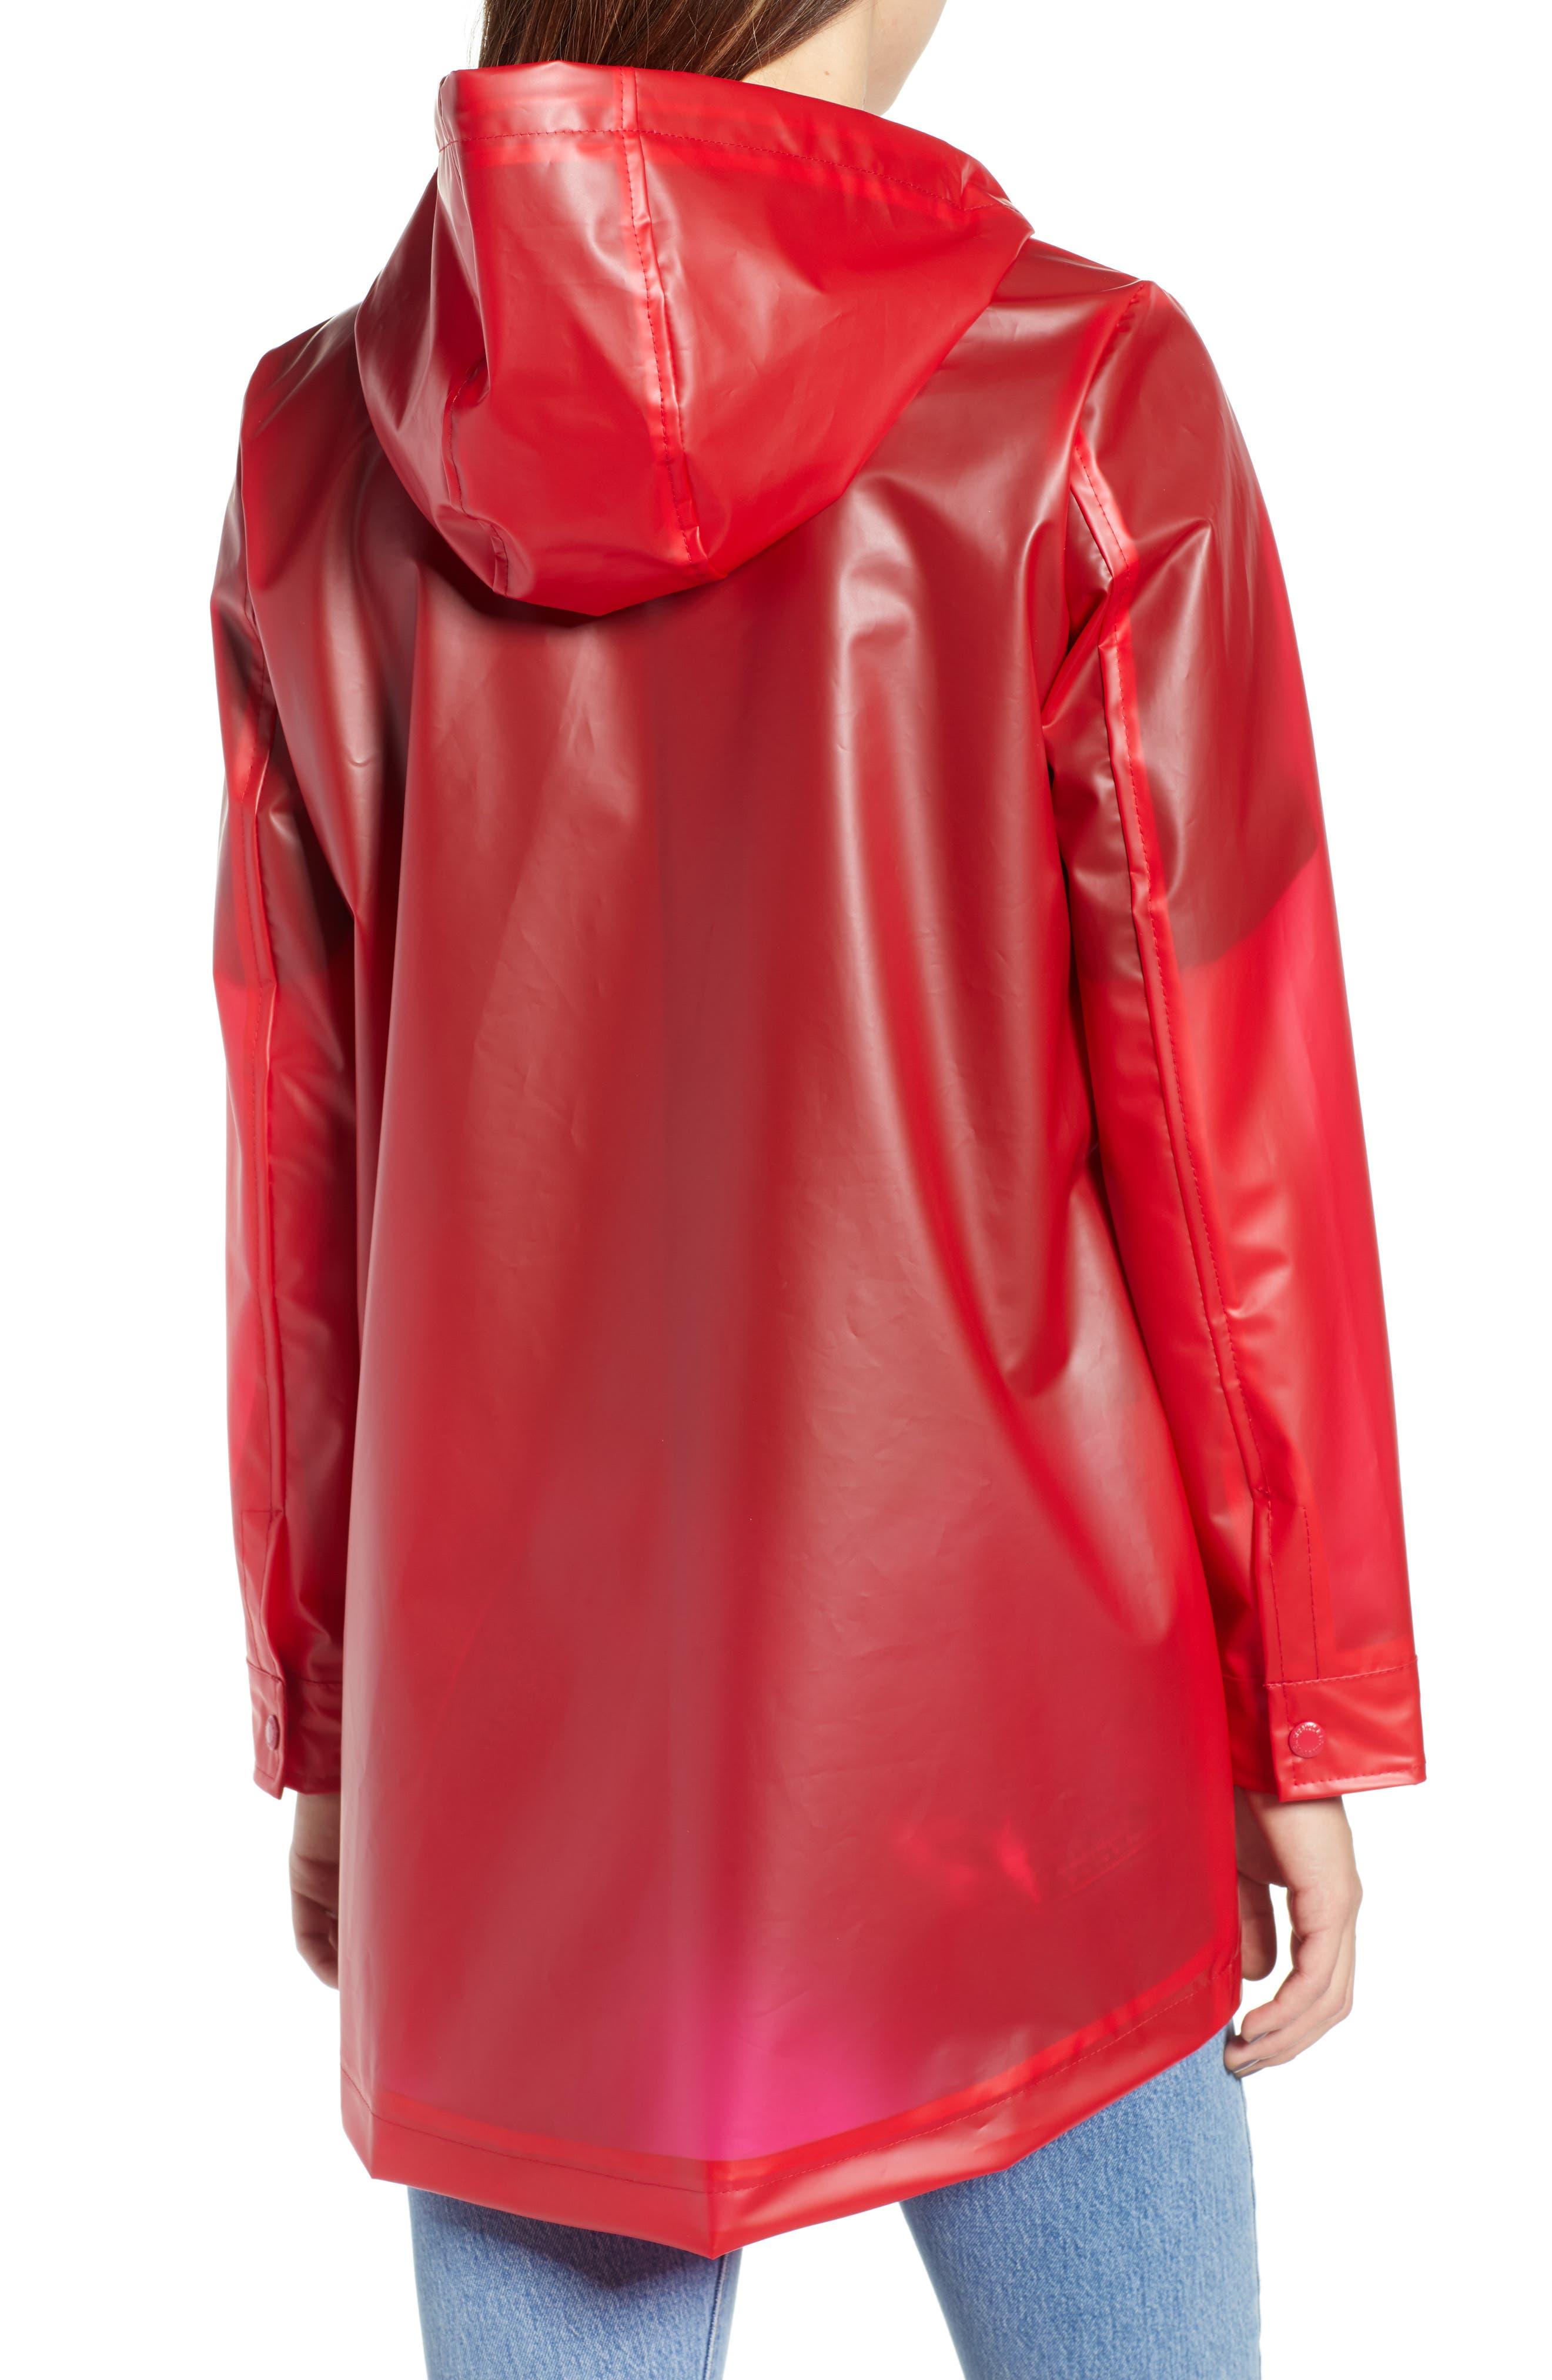 Translucent Rain Jacket,                             Alternate thumbnail 2, color,                             RED LYCHEE